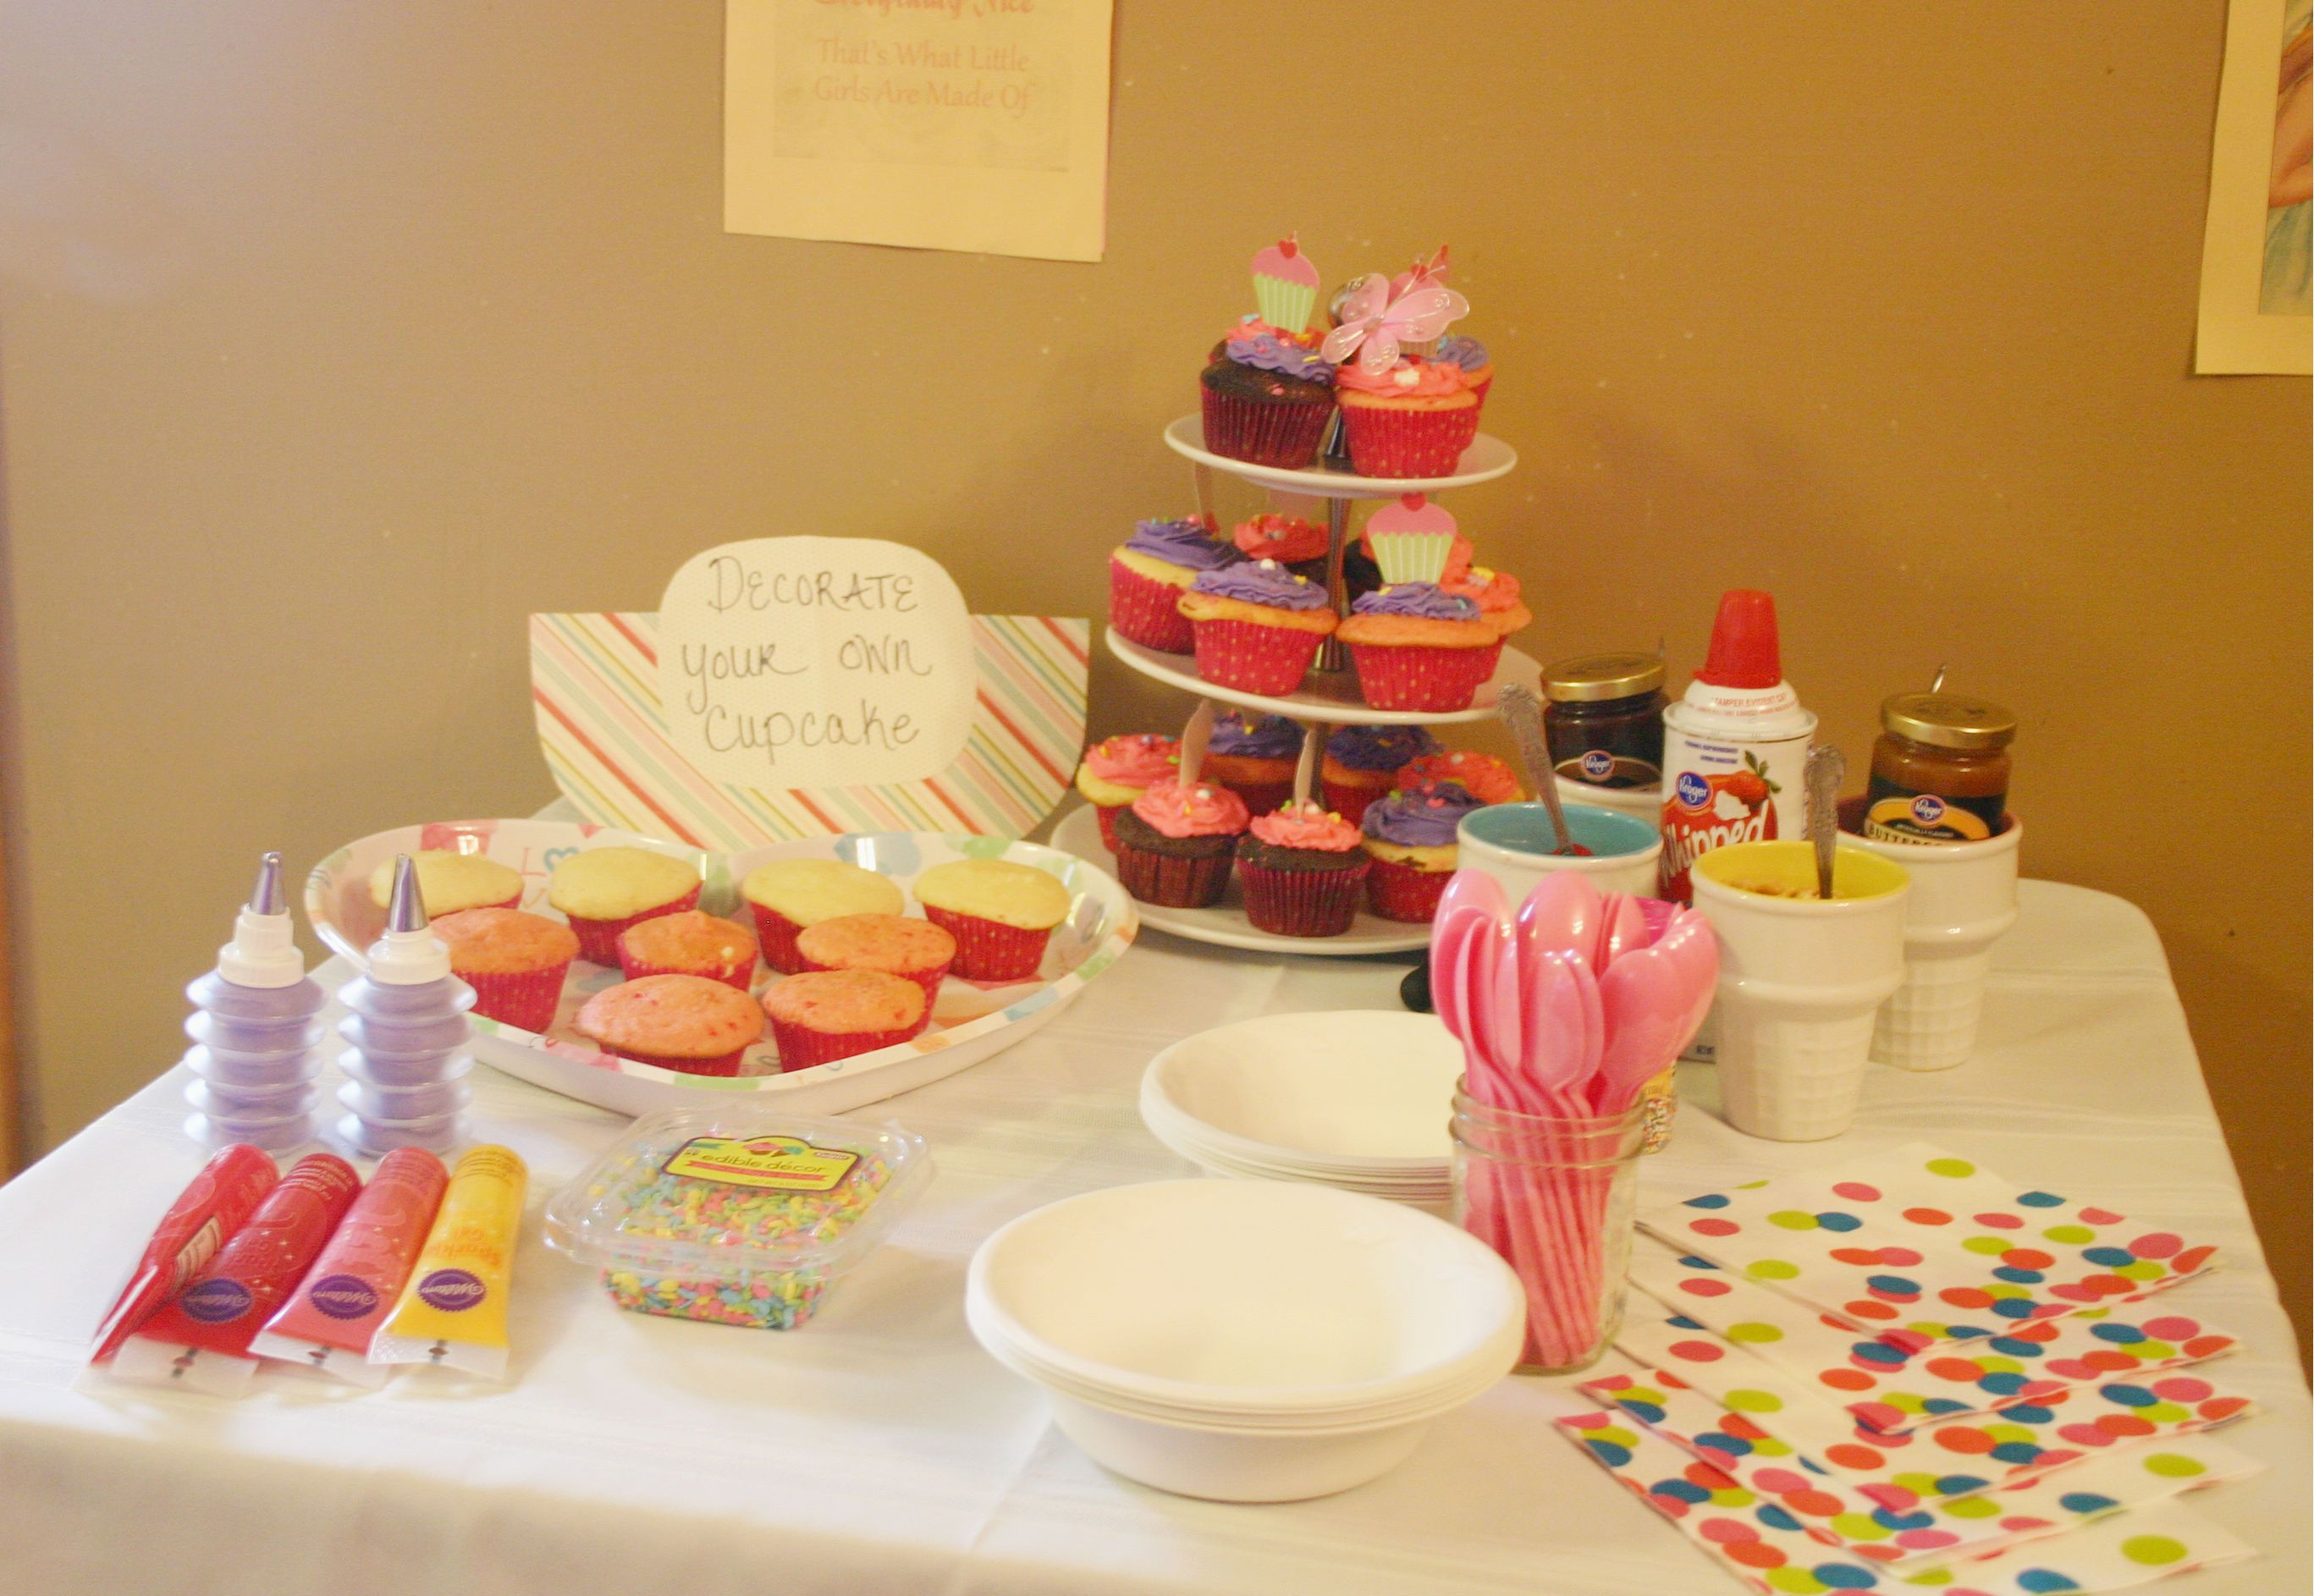 decorate your own cupcake u0026 ice cream bar sugar u0026 spice cupcake